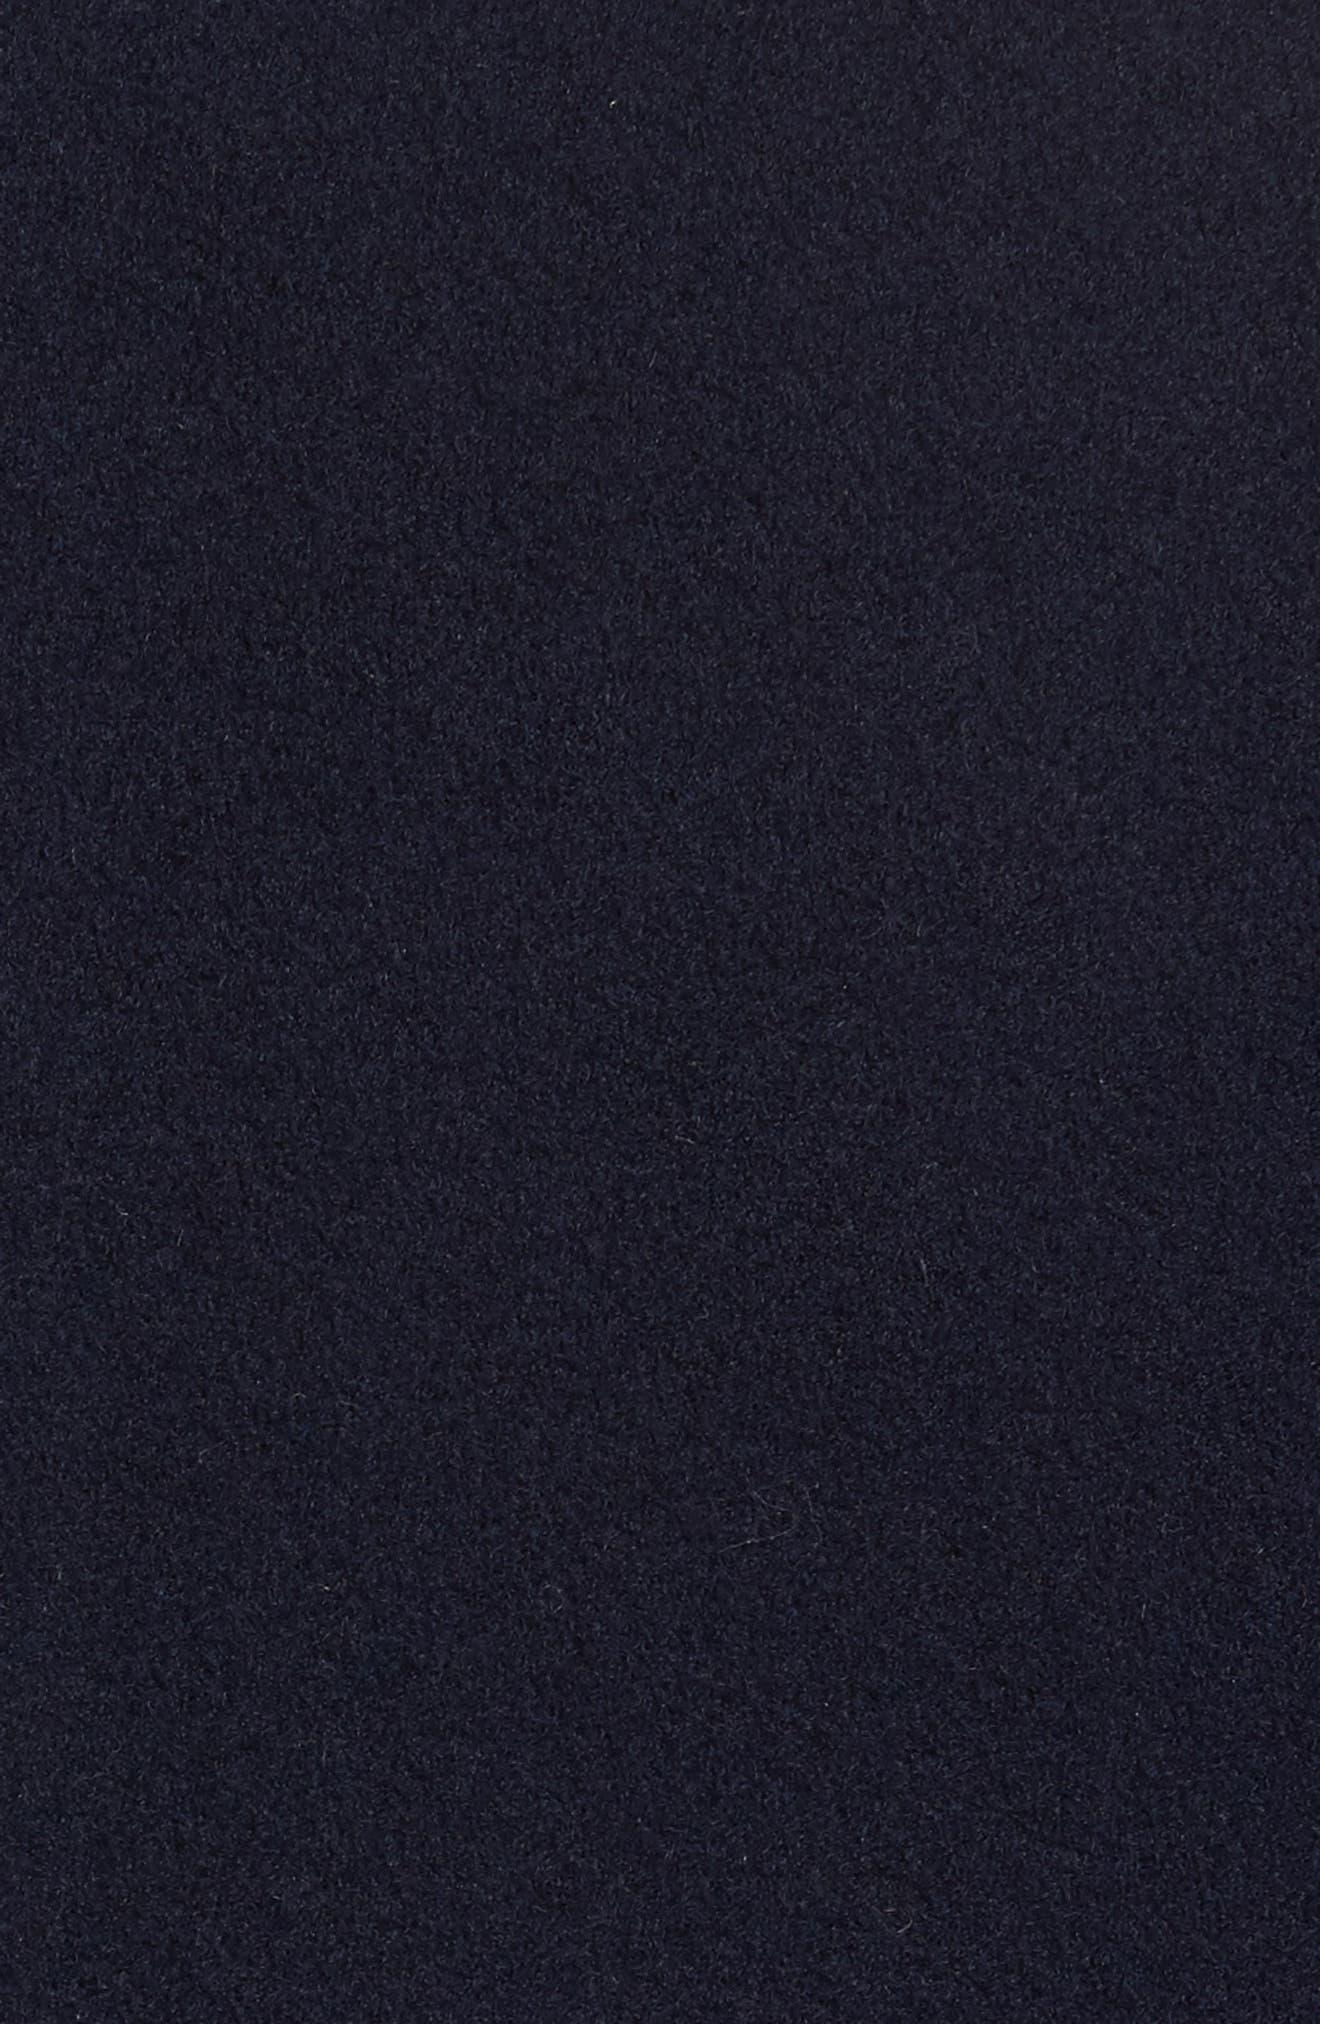 Double Breasted Loro Piana Wool Coat,                             Alternate thumbnail 6, color,                             004